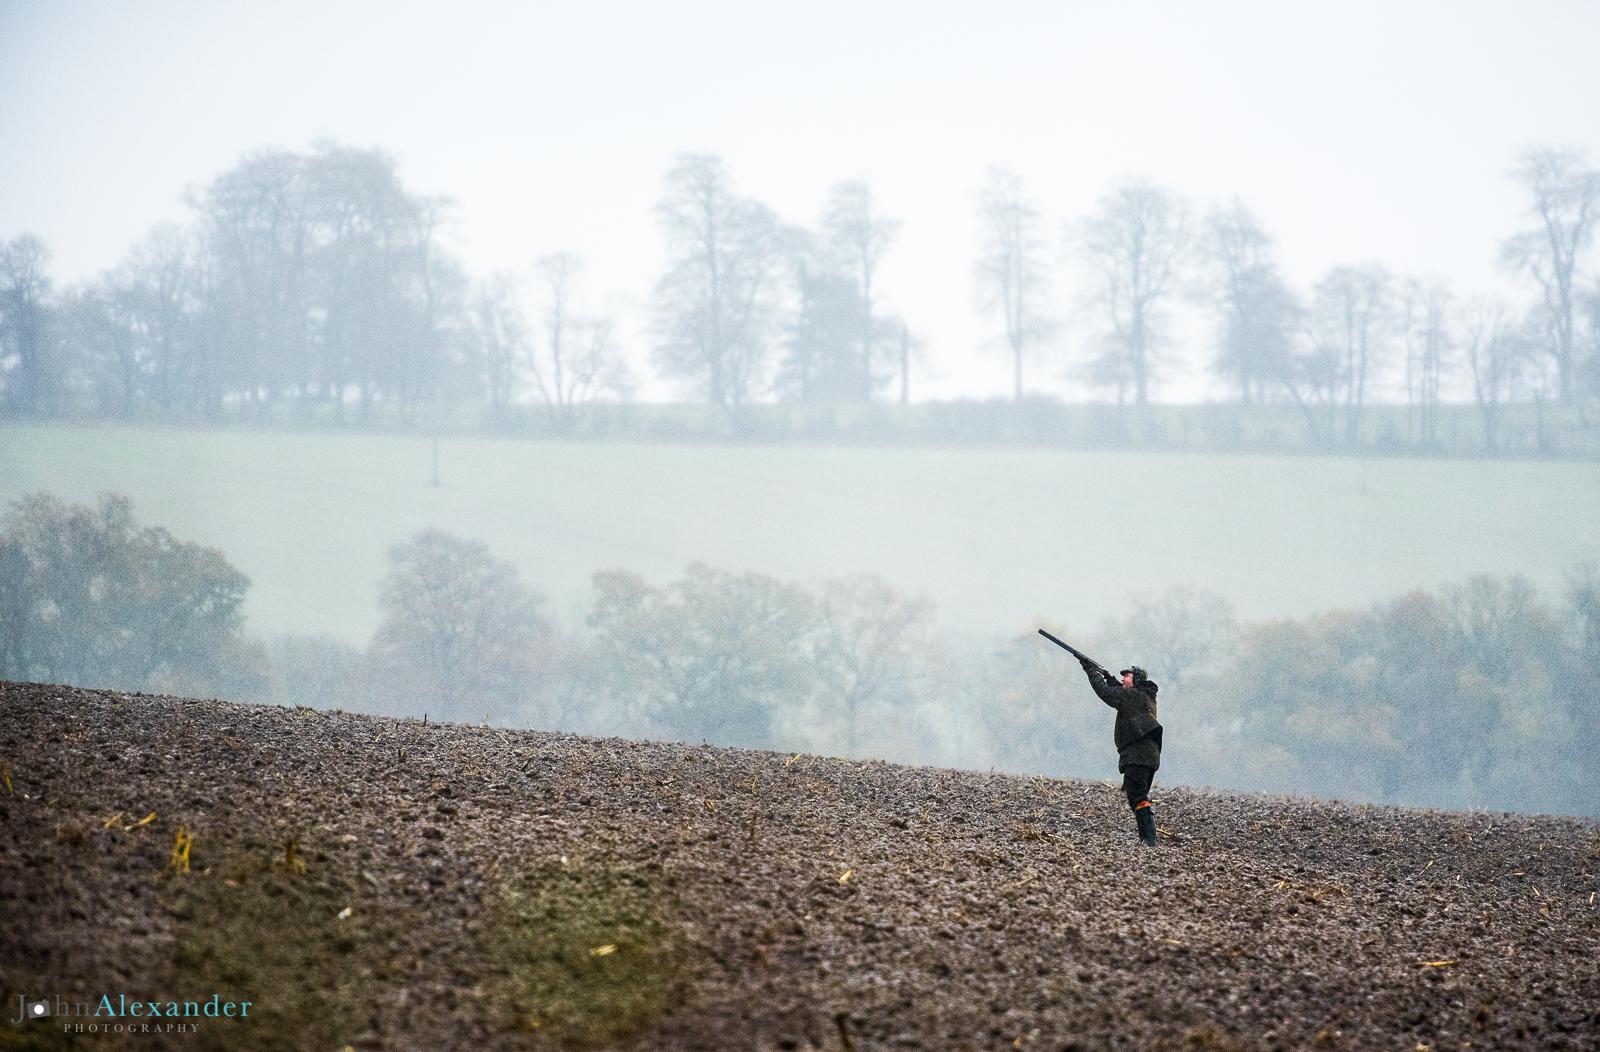 gun shooting in the mist in the UK